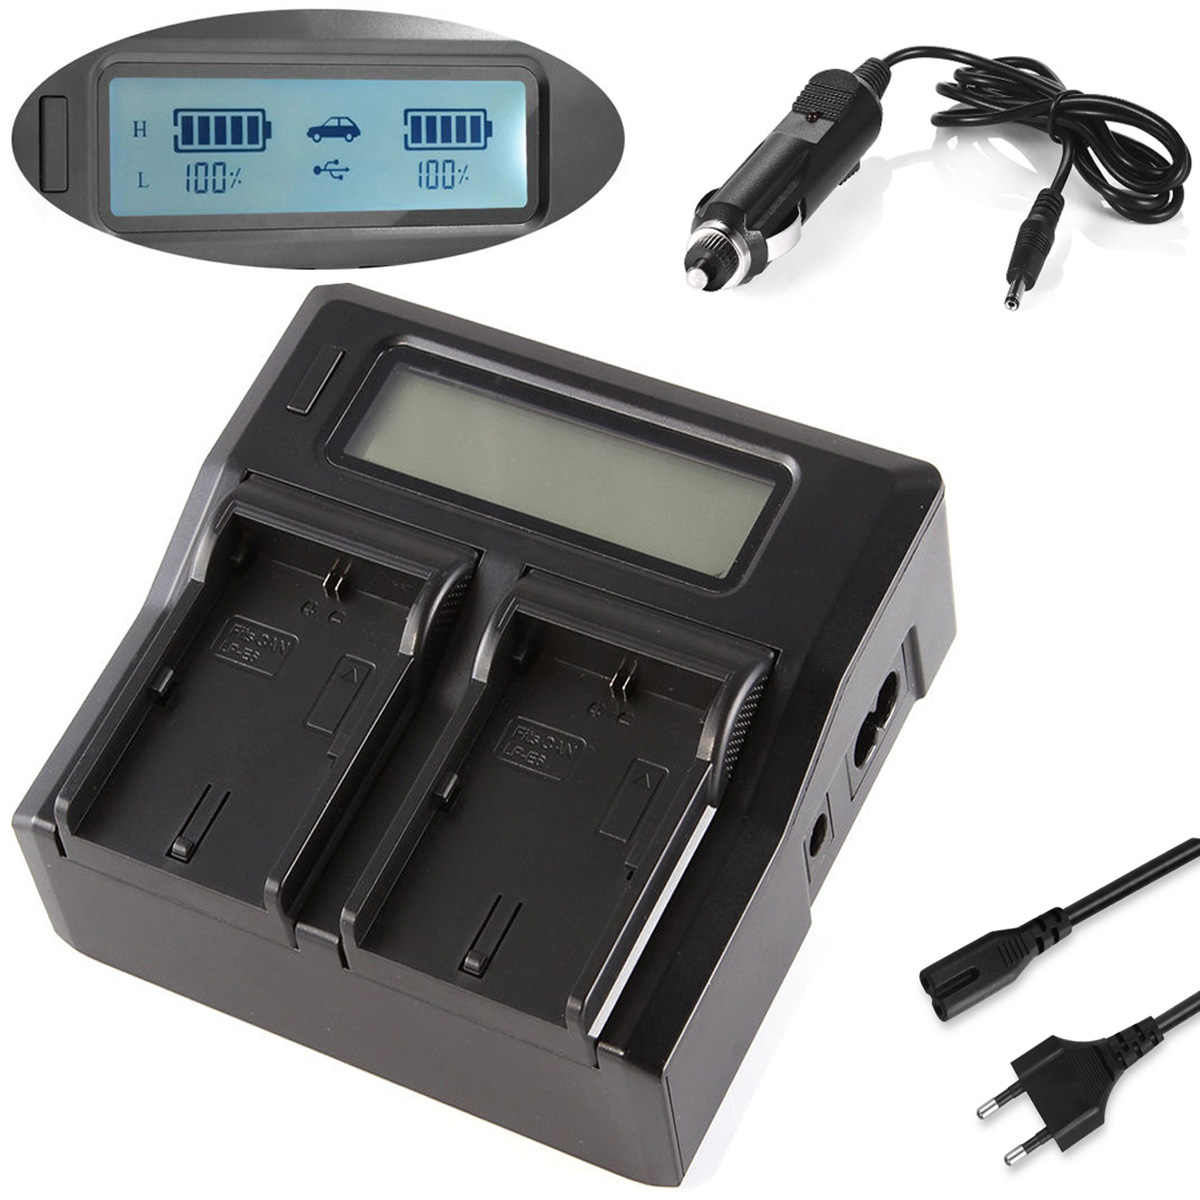 HXR-MC50U Battery Pack for Sony HXR-MC50 HXR-MC50E AVCHD Camcorder